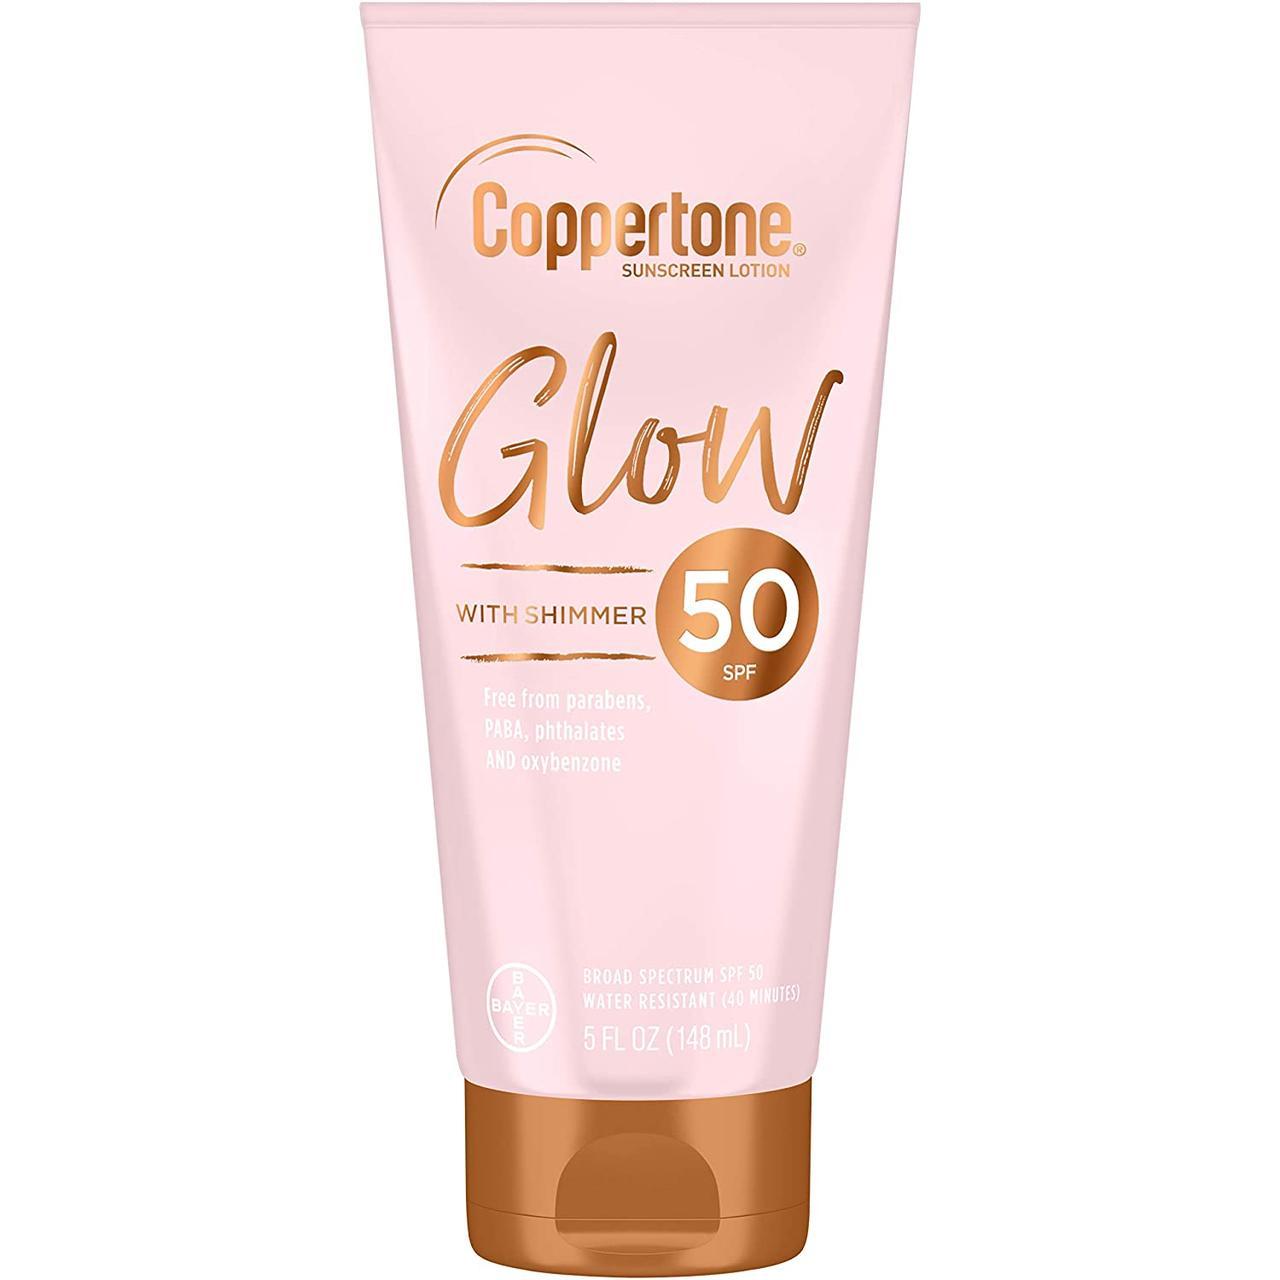 Cолнцезащитный лосьон для тела с шиммером Coppertone Glow Sunscreen Lotion Shimmer SPF 50